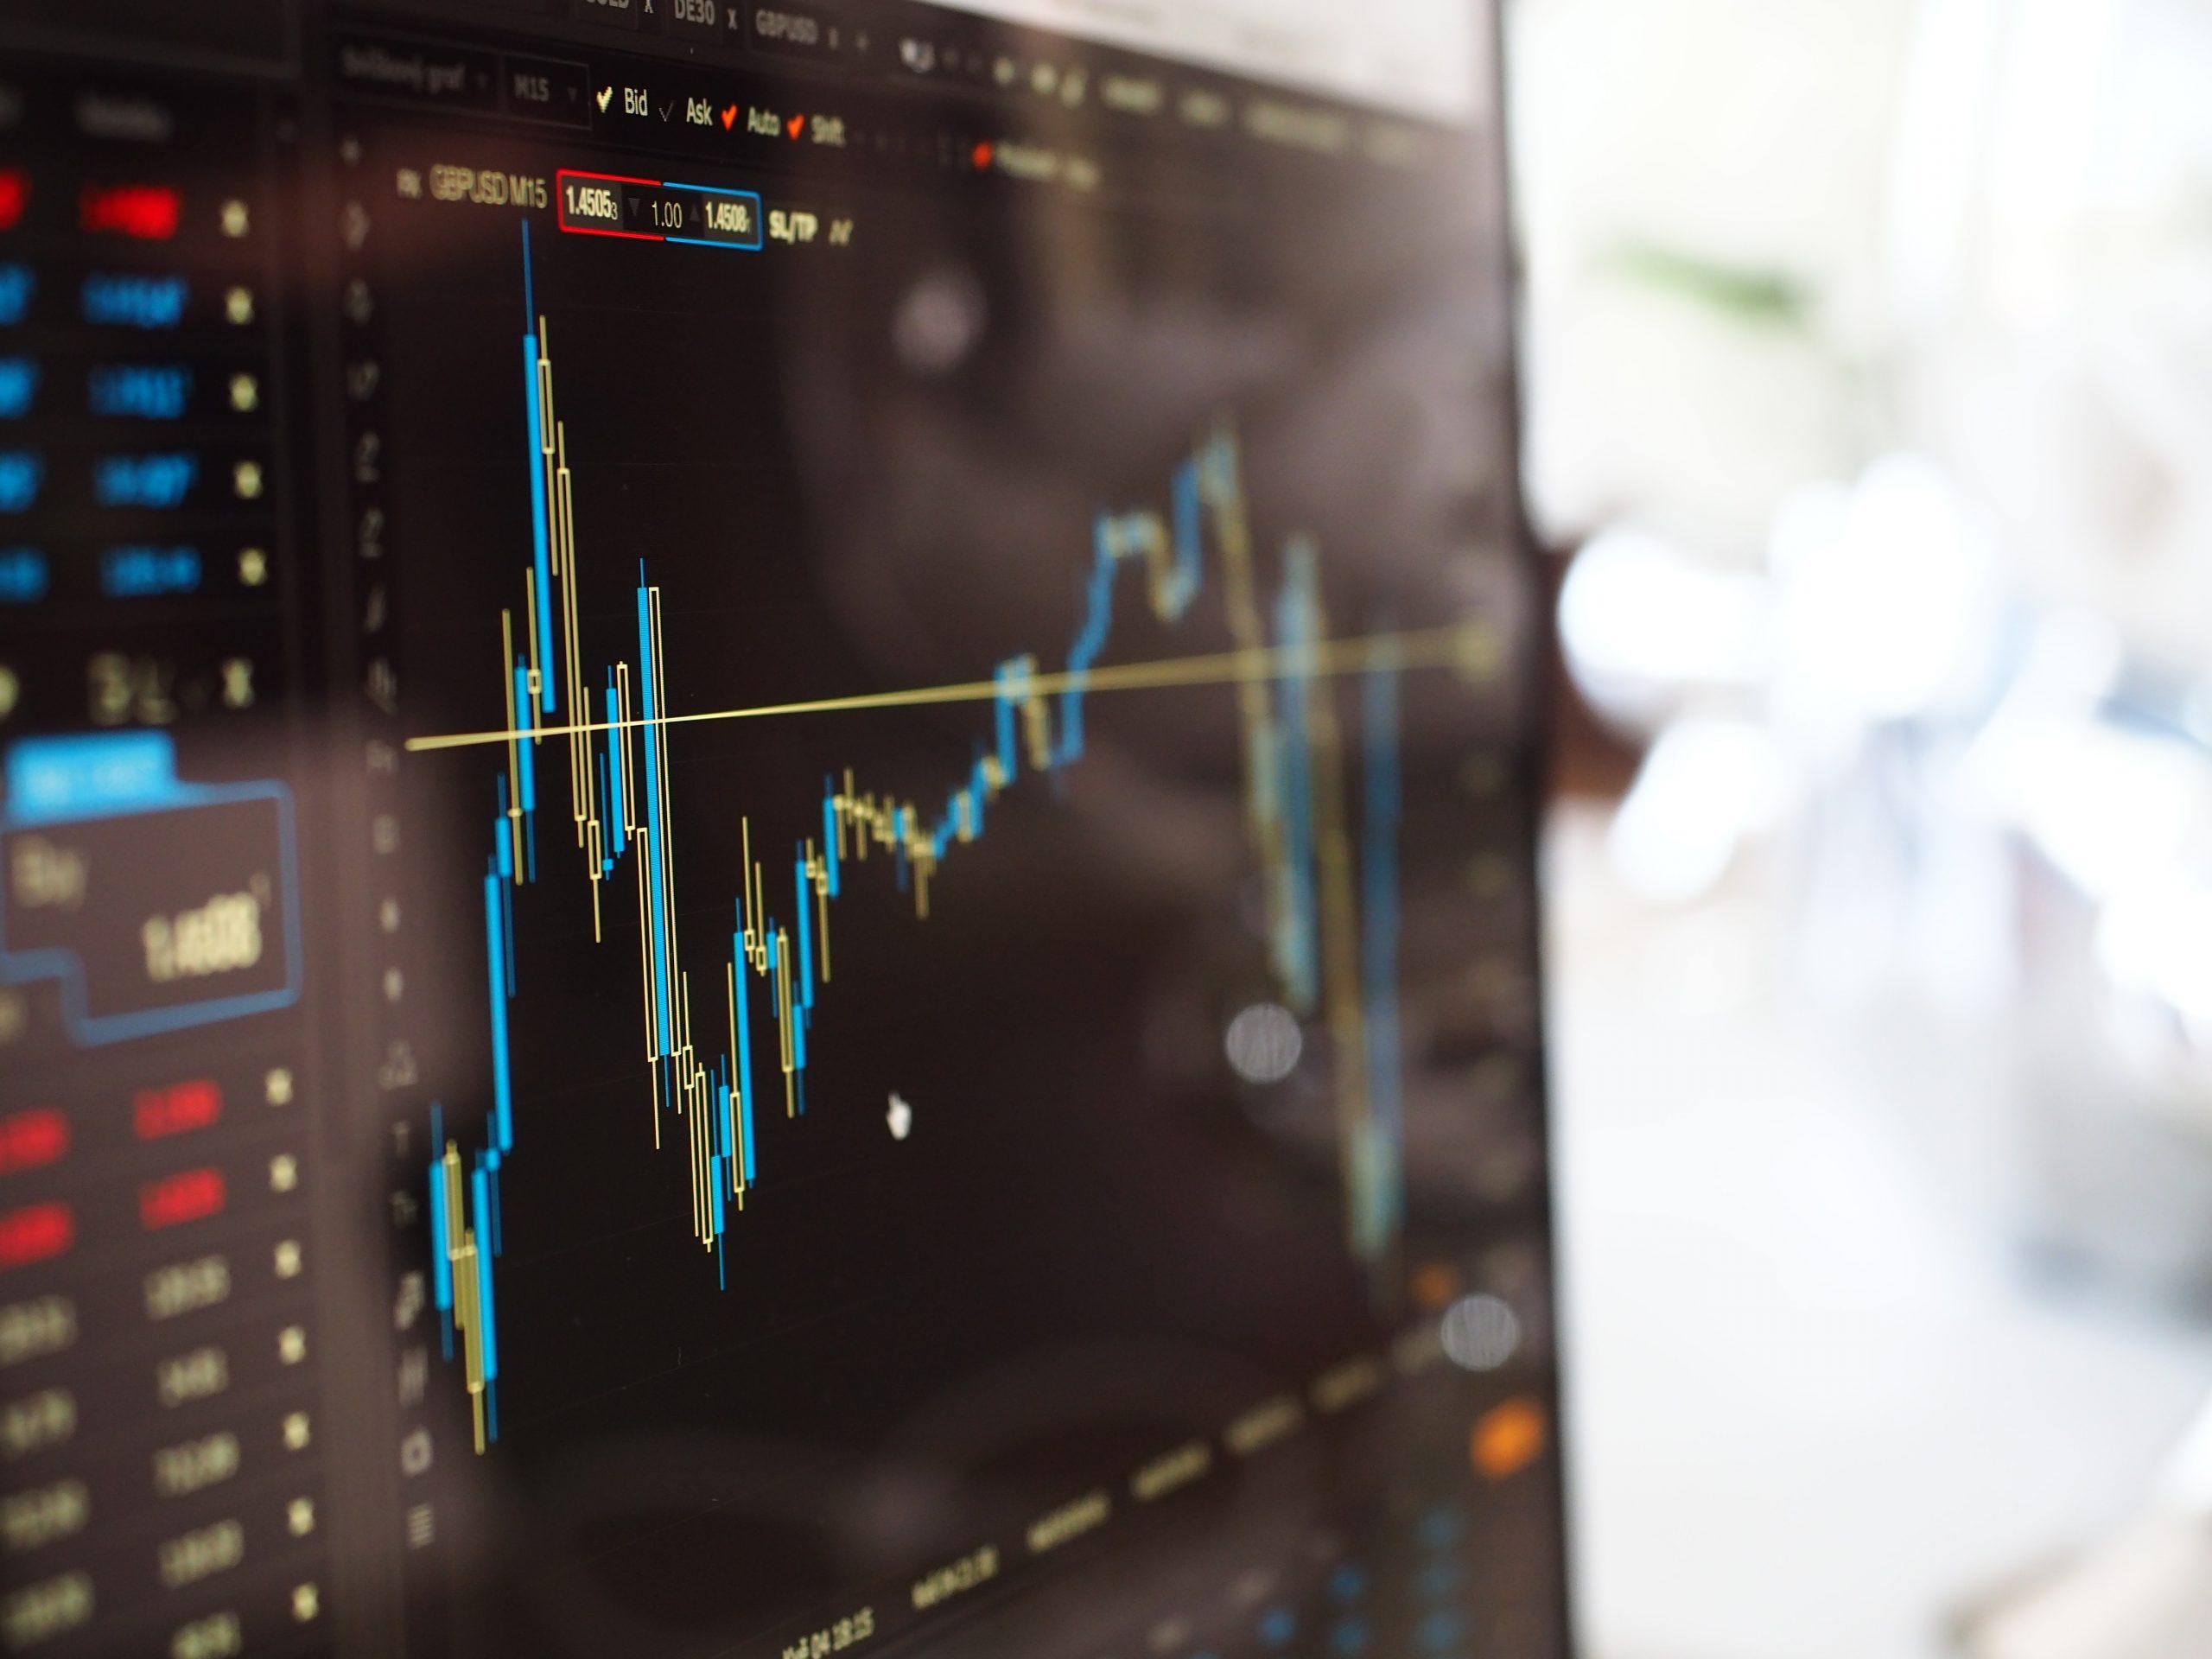 ftse companies - stock market